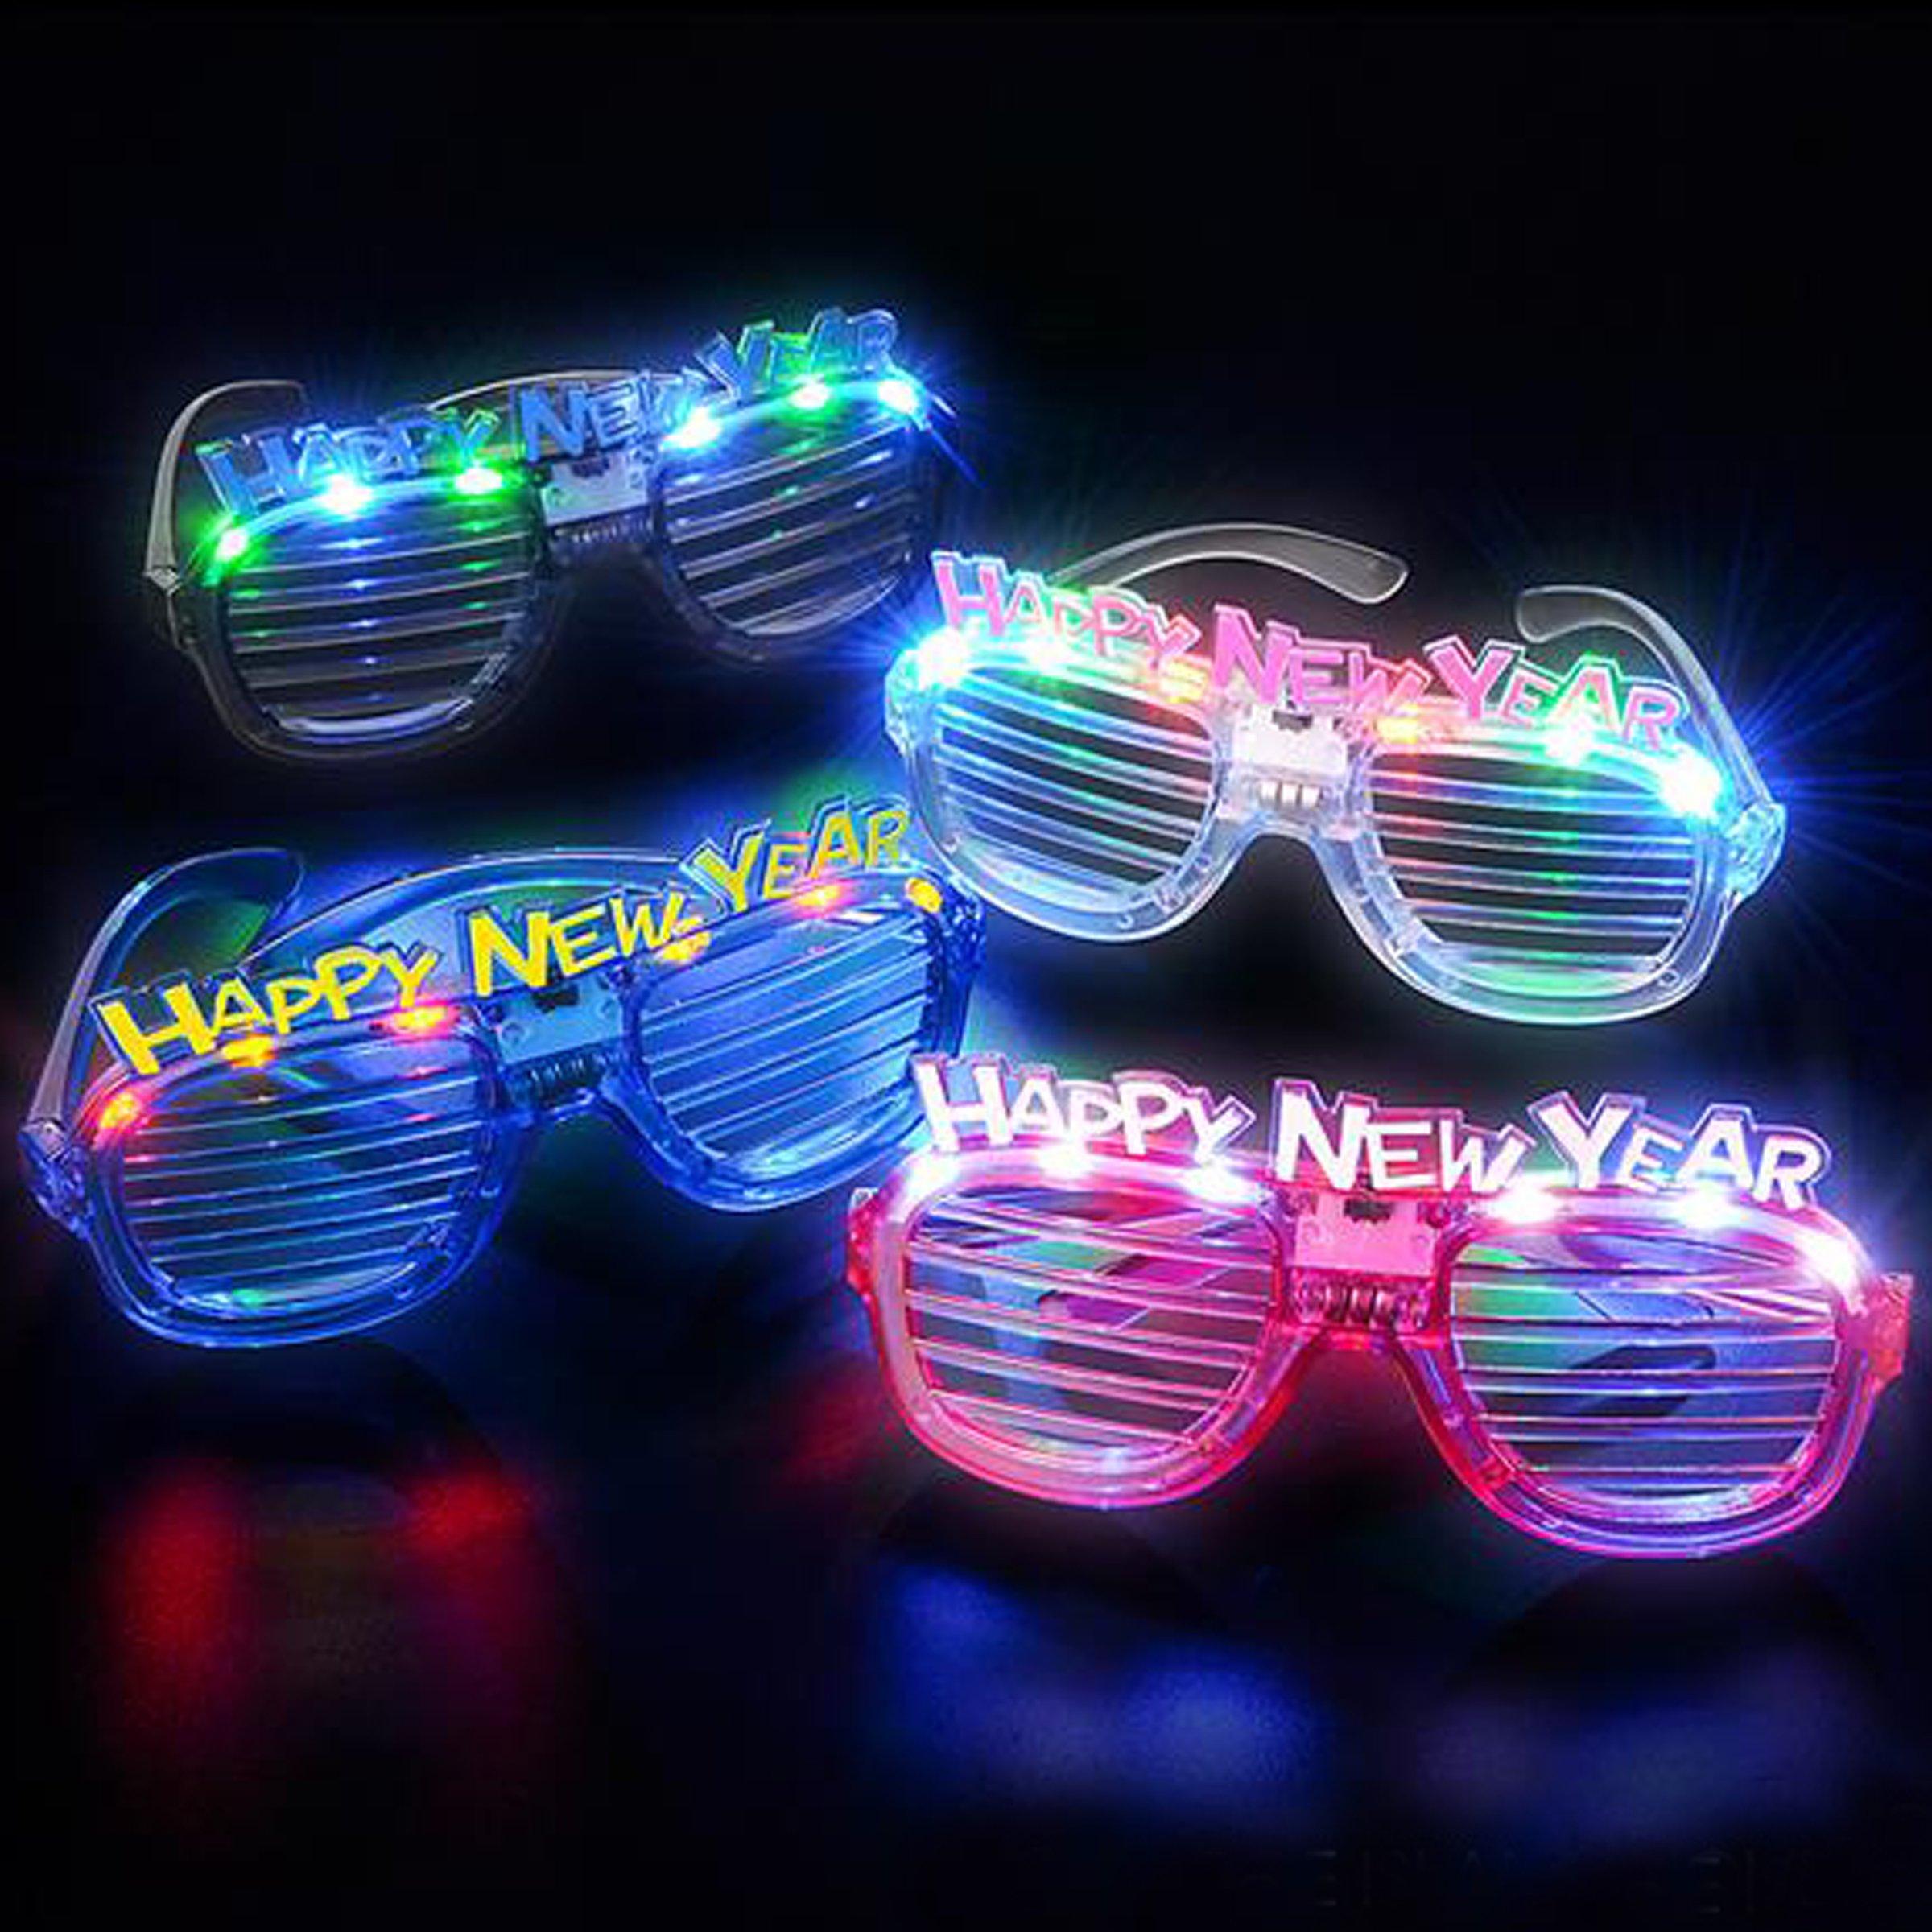 Amazon.com: Happy New Year Headbands (asstd colors) Party ...